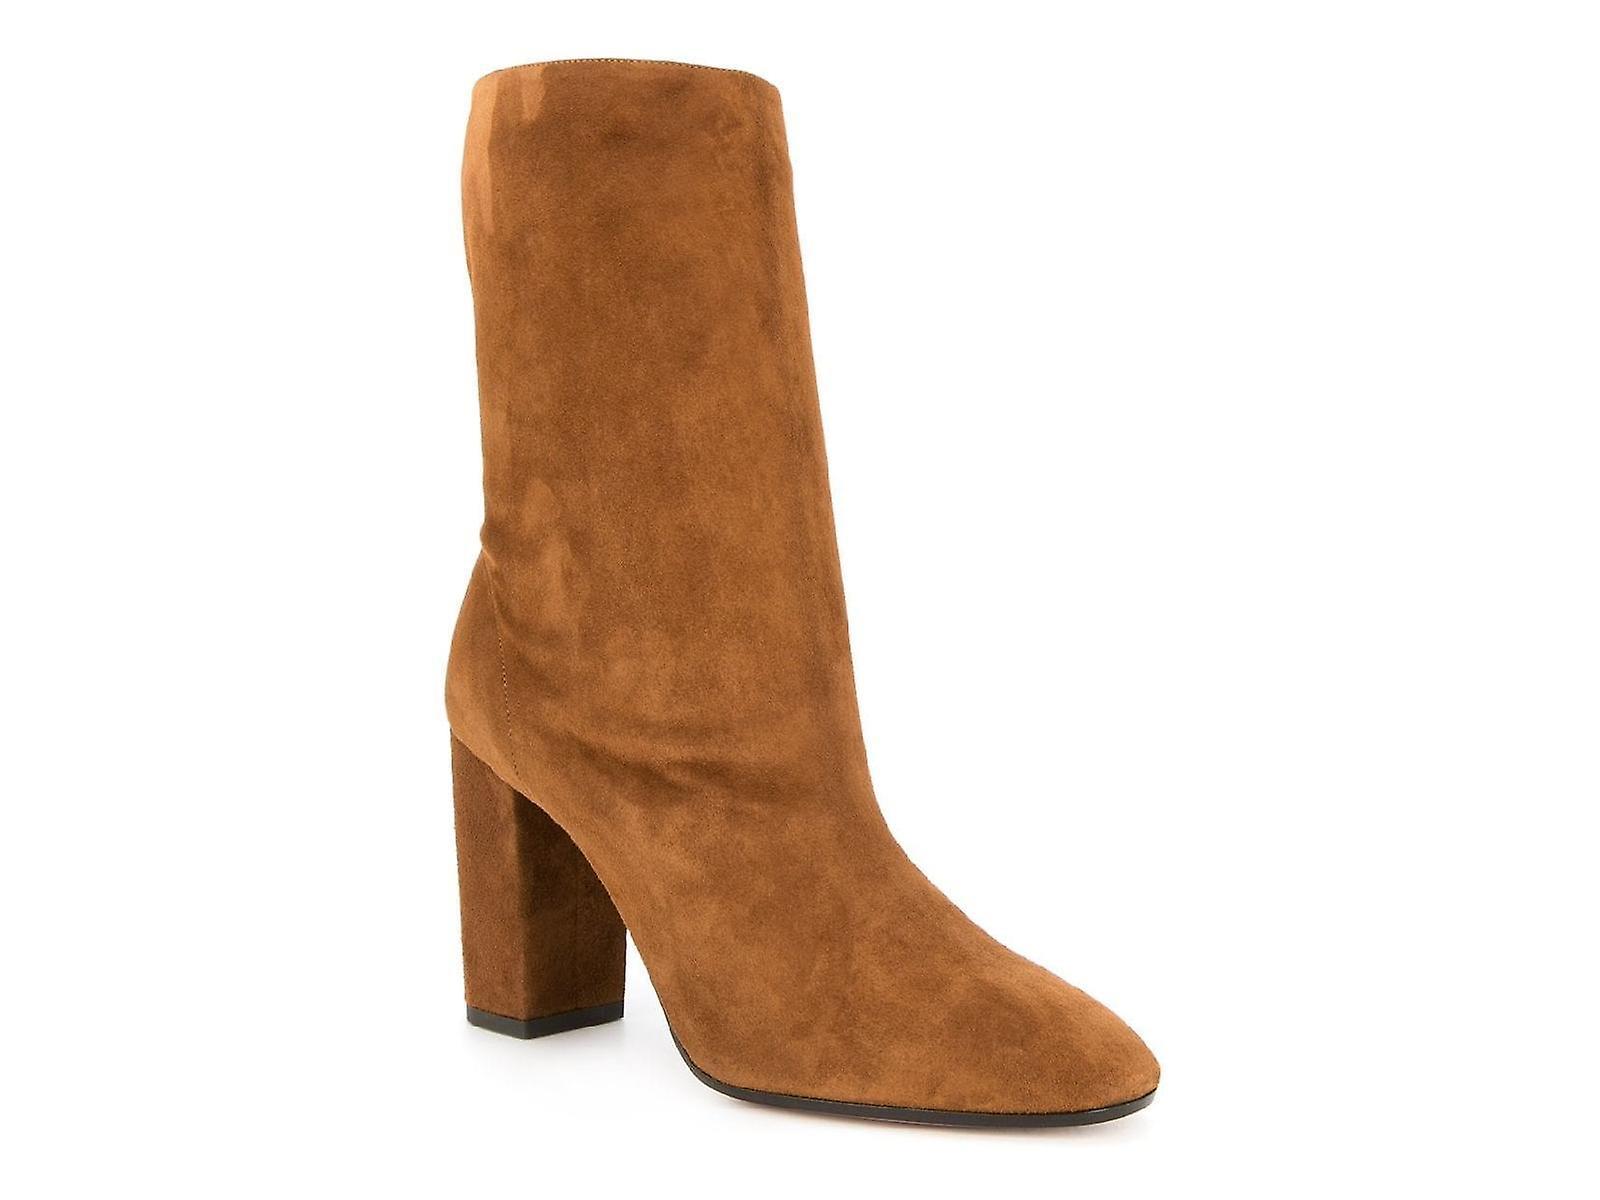 Aquazzura Boomidb0sue Women's Brown Suede Ankle Boots